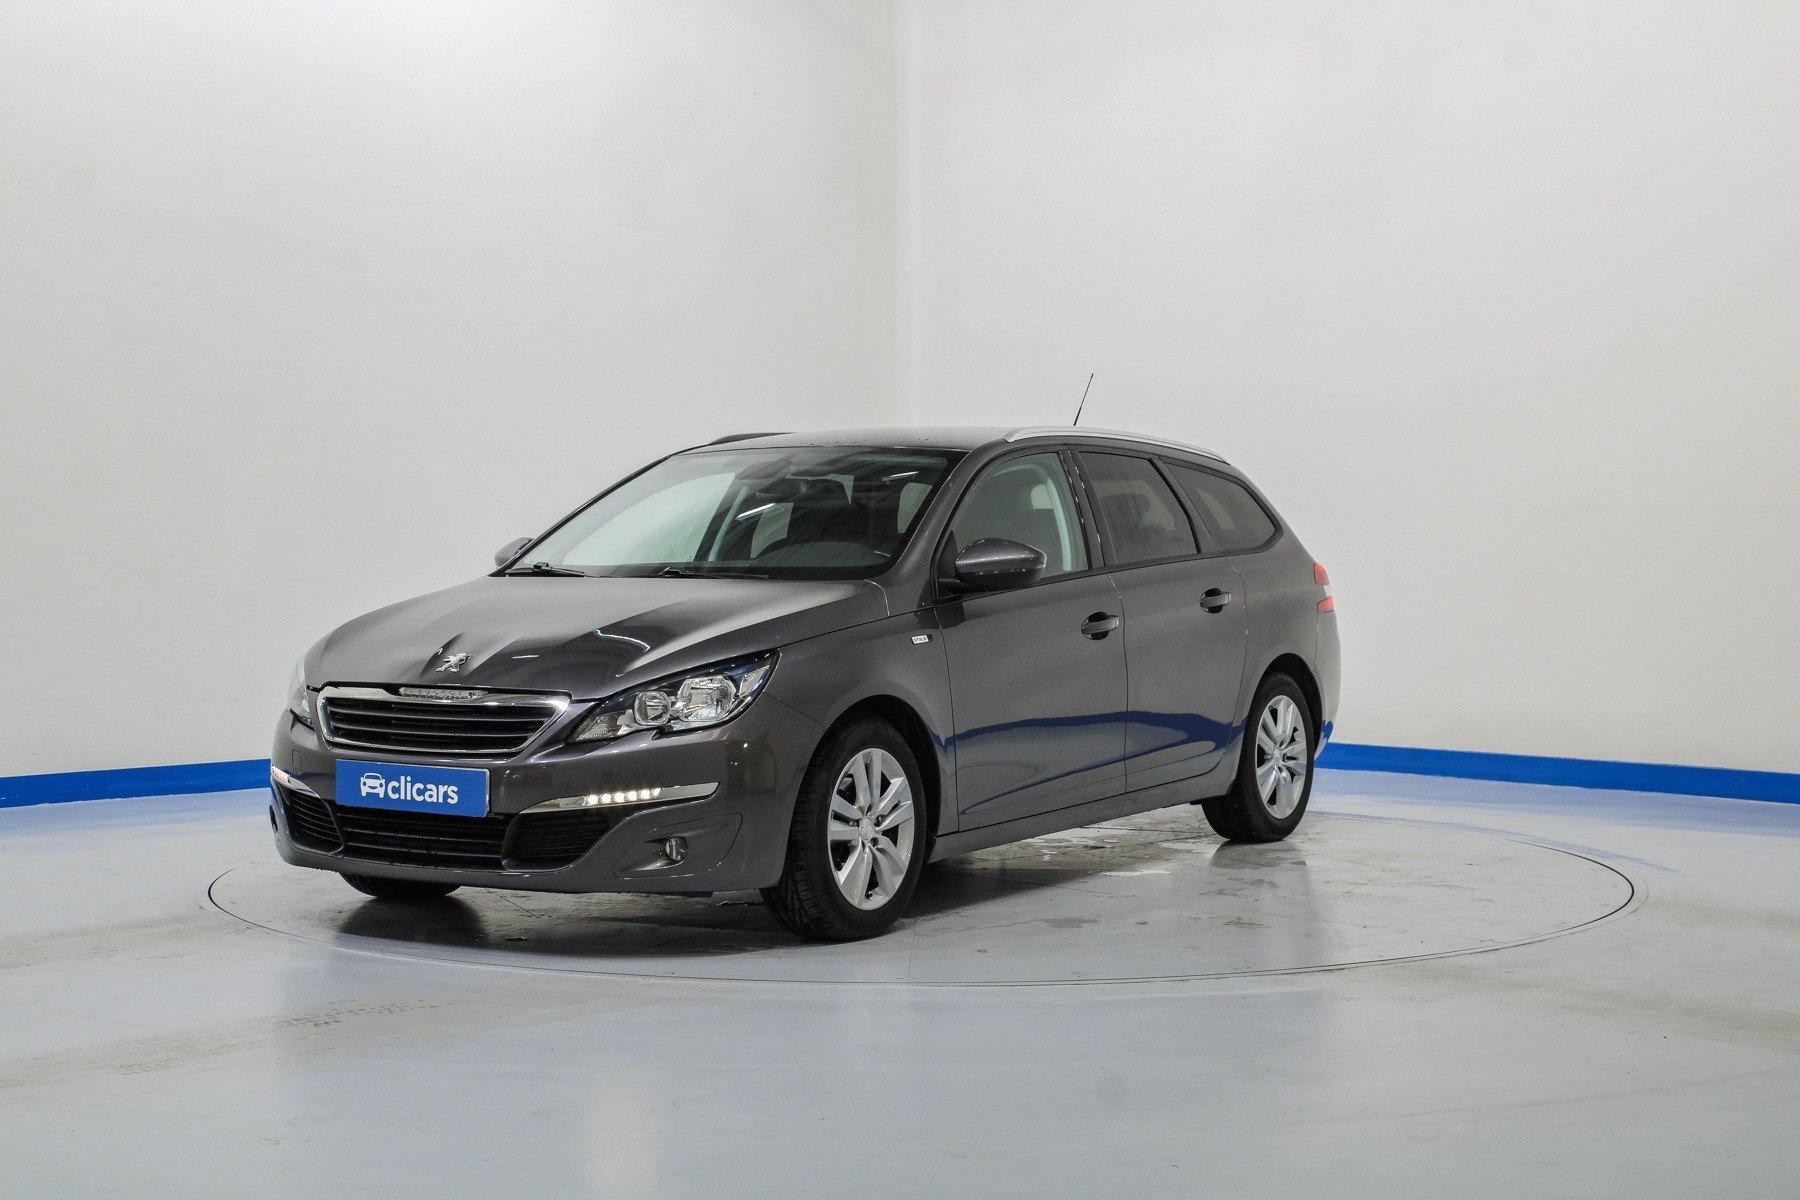 Peugeot 308 Diésel SW Style 1.6 BlueHDi 120 1